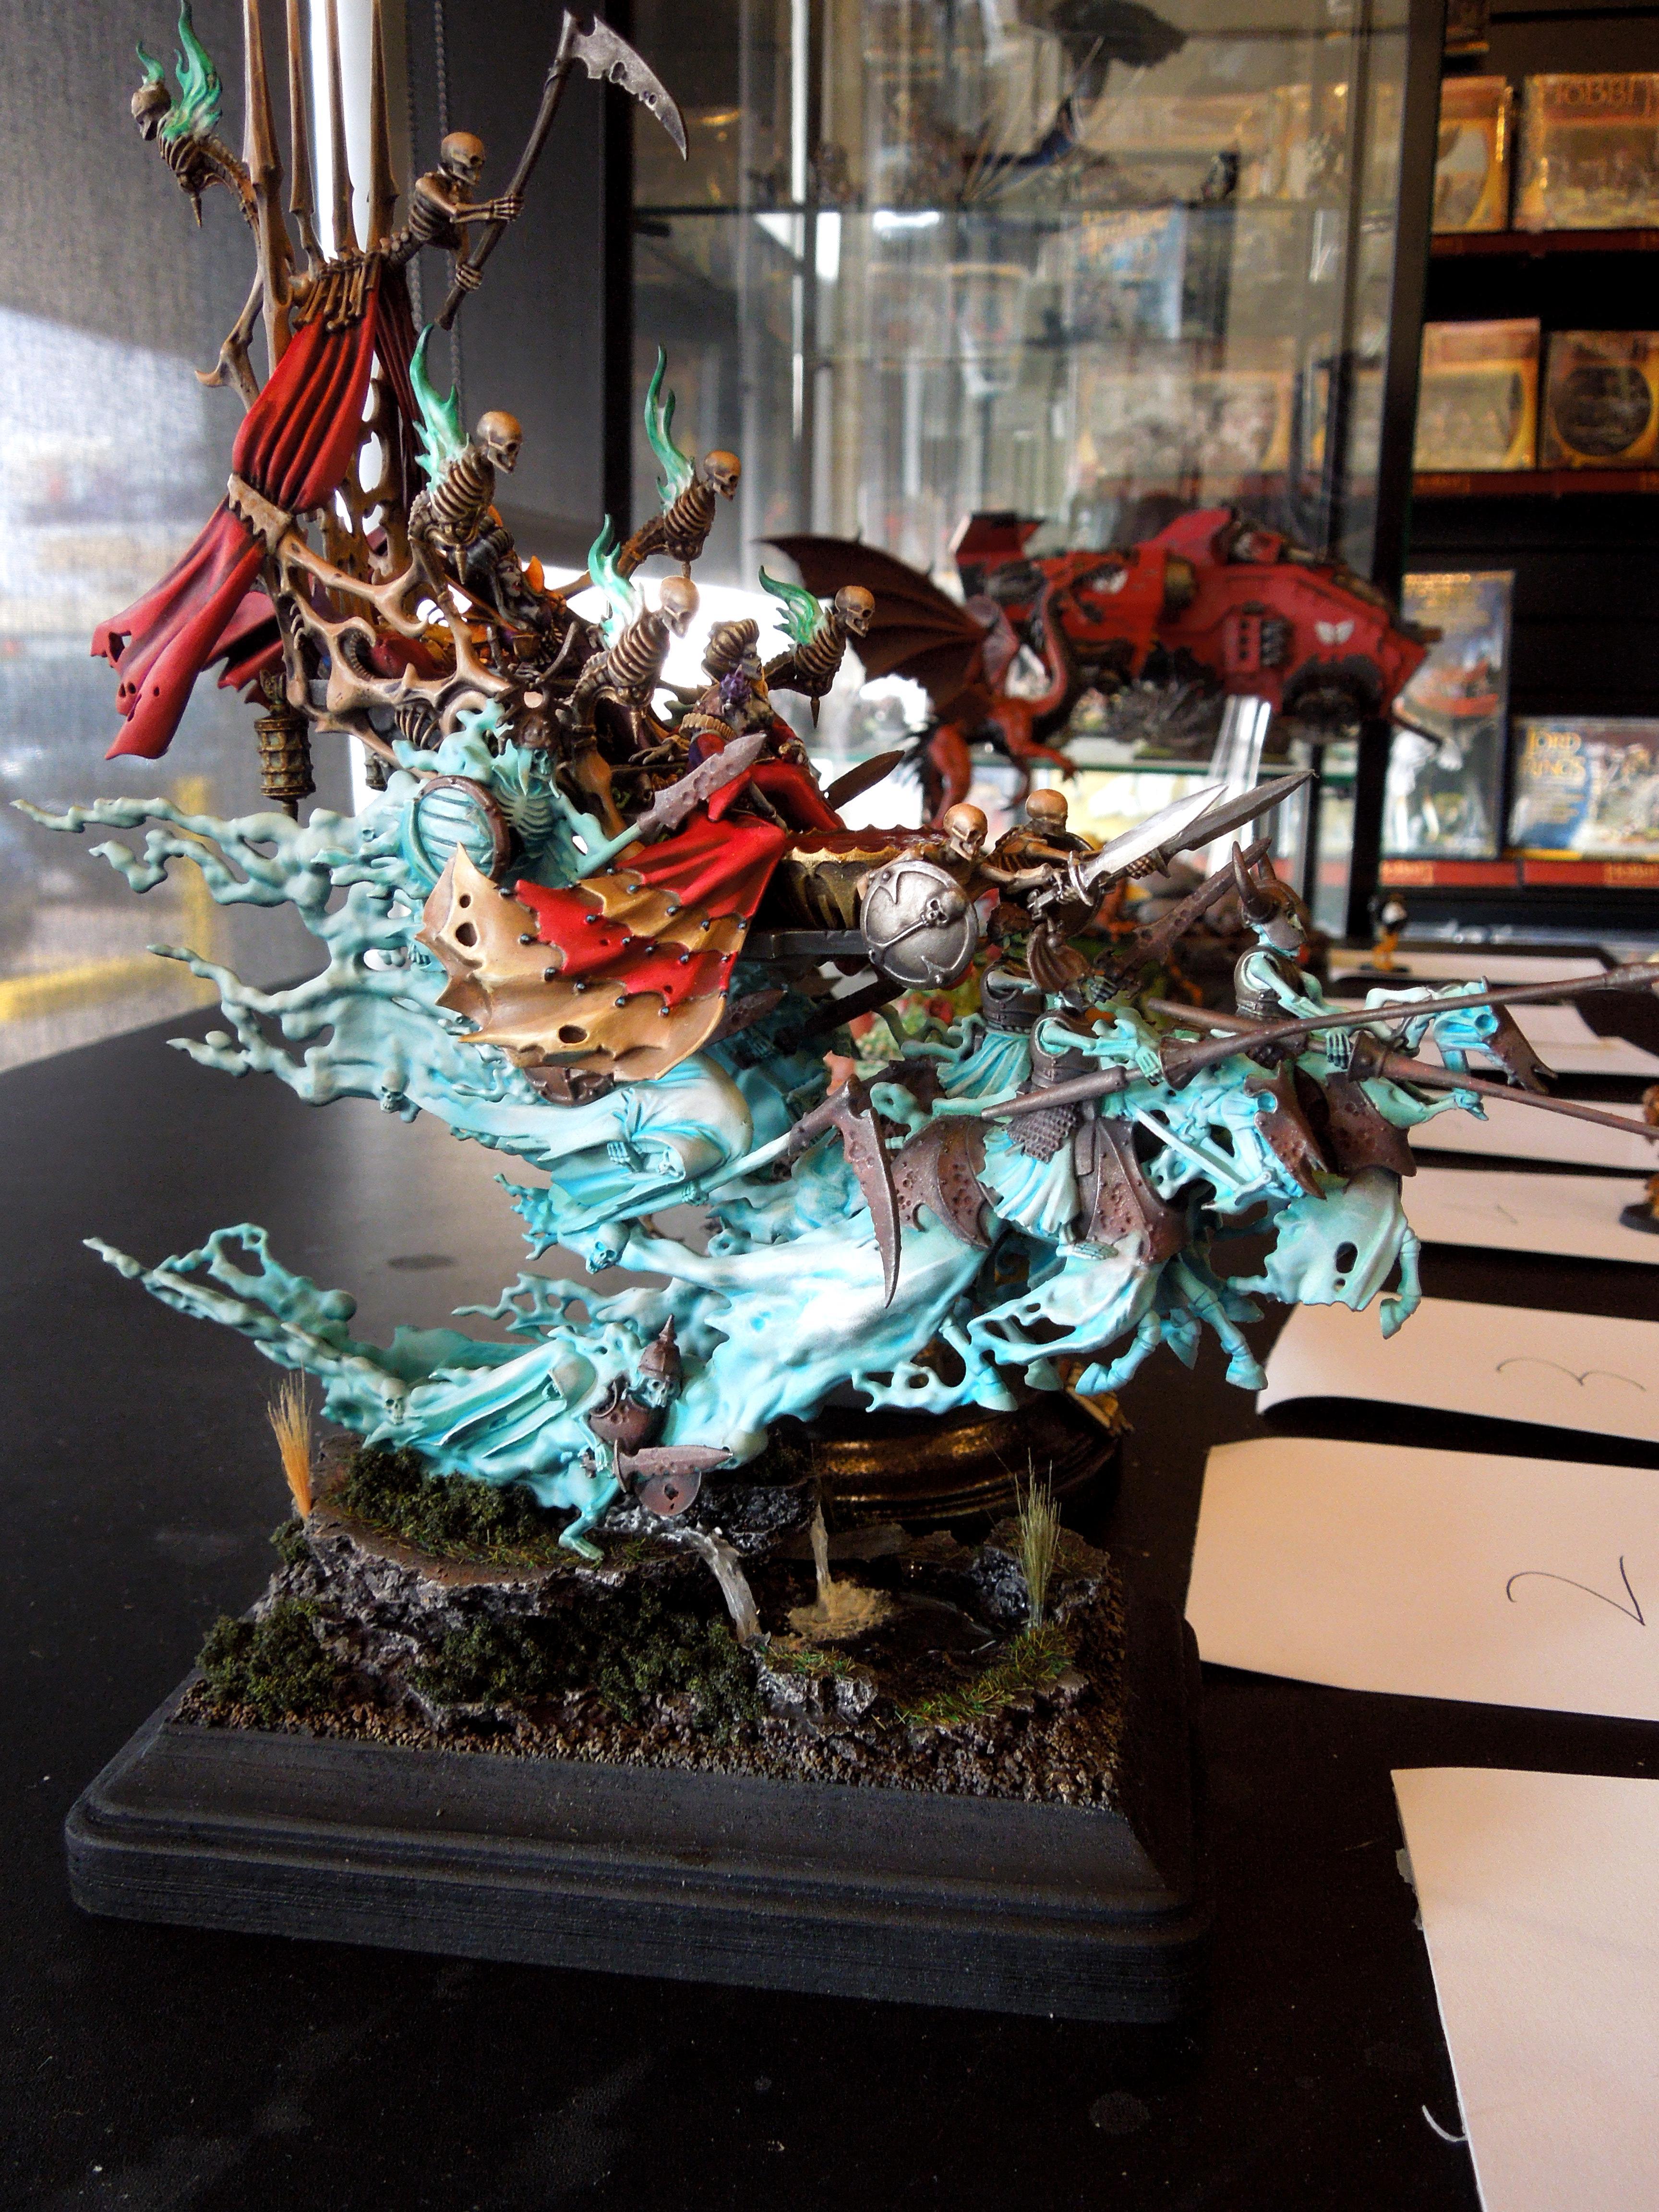 Coven Throne, Vampire, Vampire Counts, Vc, Warhammer Fantasy